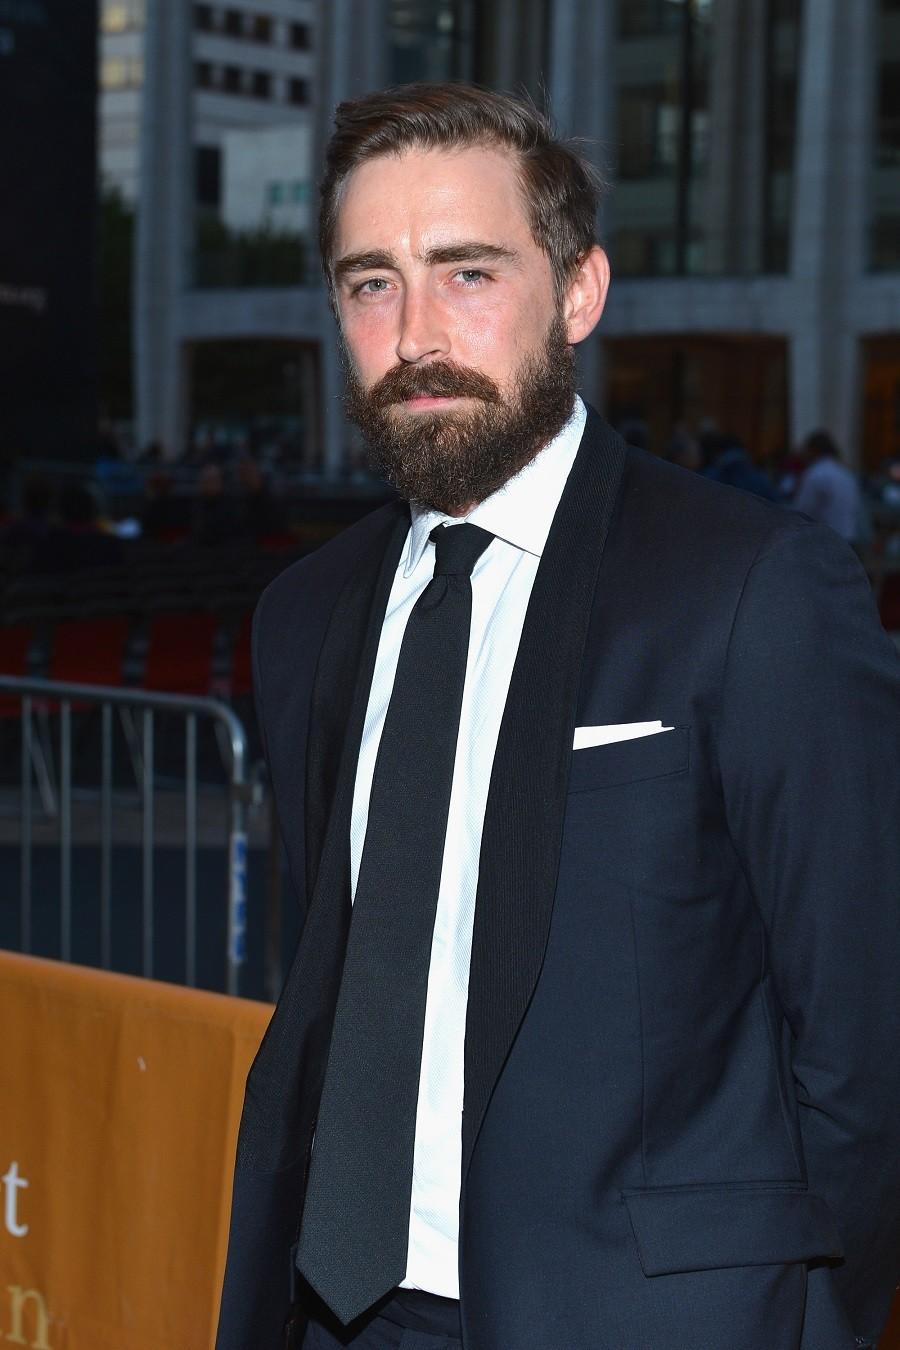 Actor Lee Pace attends the 2012 Metropolitan Opera Season Opening Night